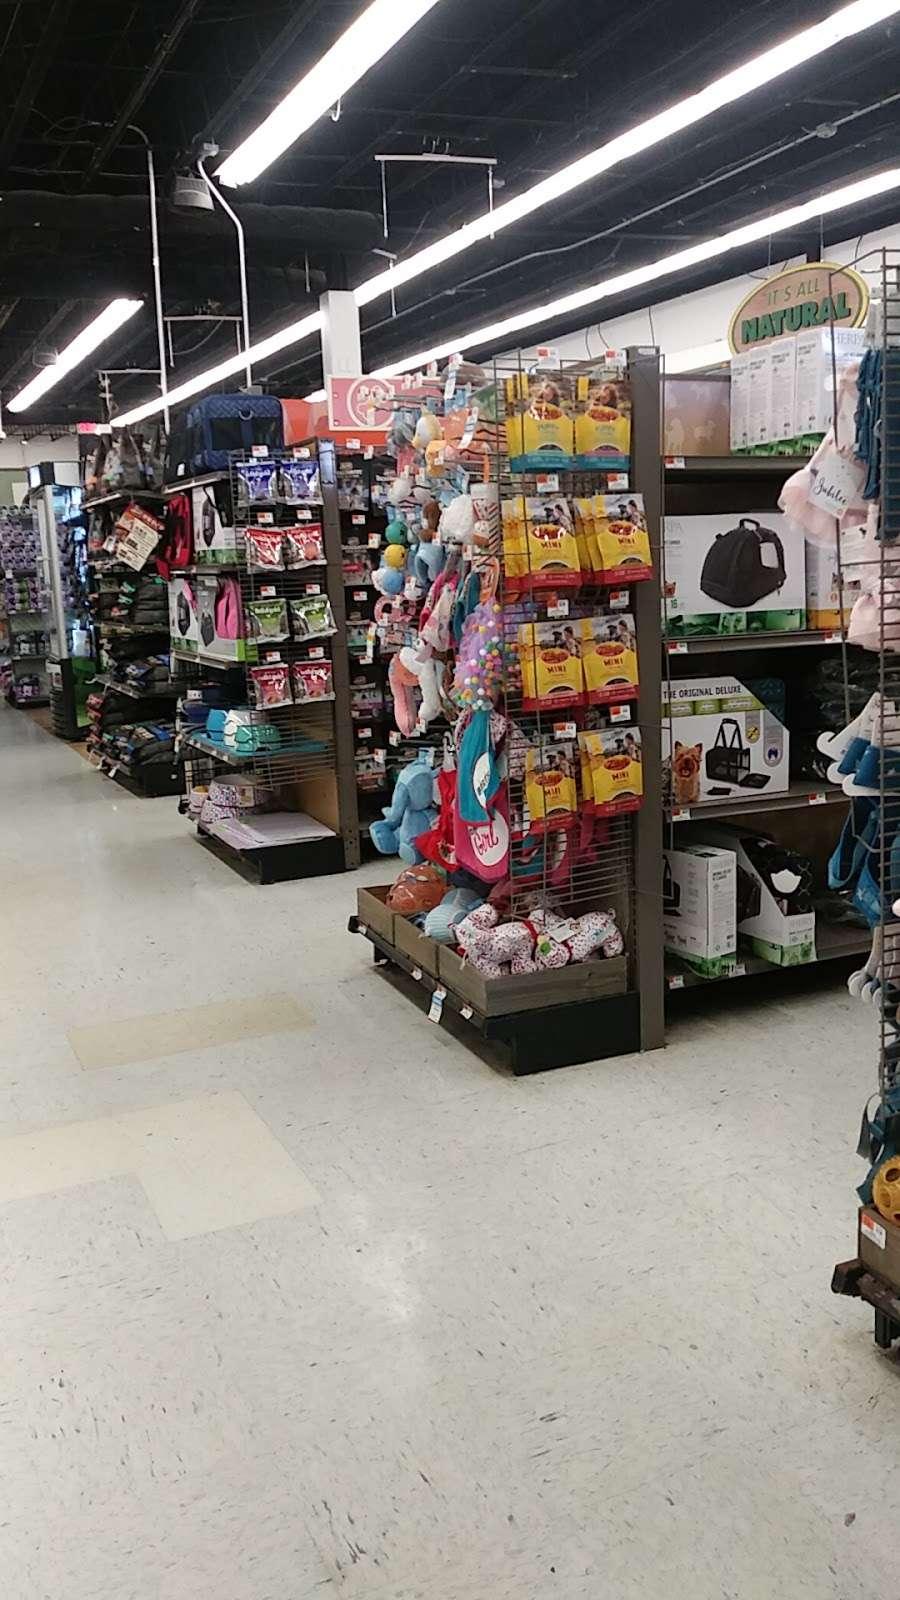 Petco Animal Supplies - store    Photo 10 of 10   Address: 780 Rte 3 West, Clifton, NJ 07012, USA   Phone: (973) 472-3344